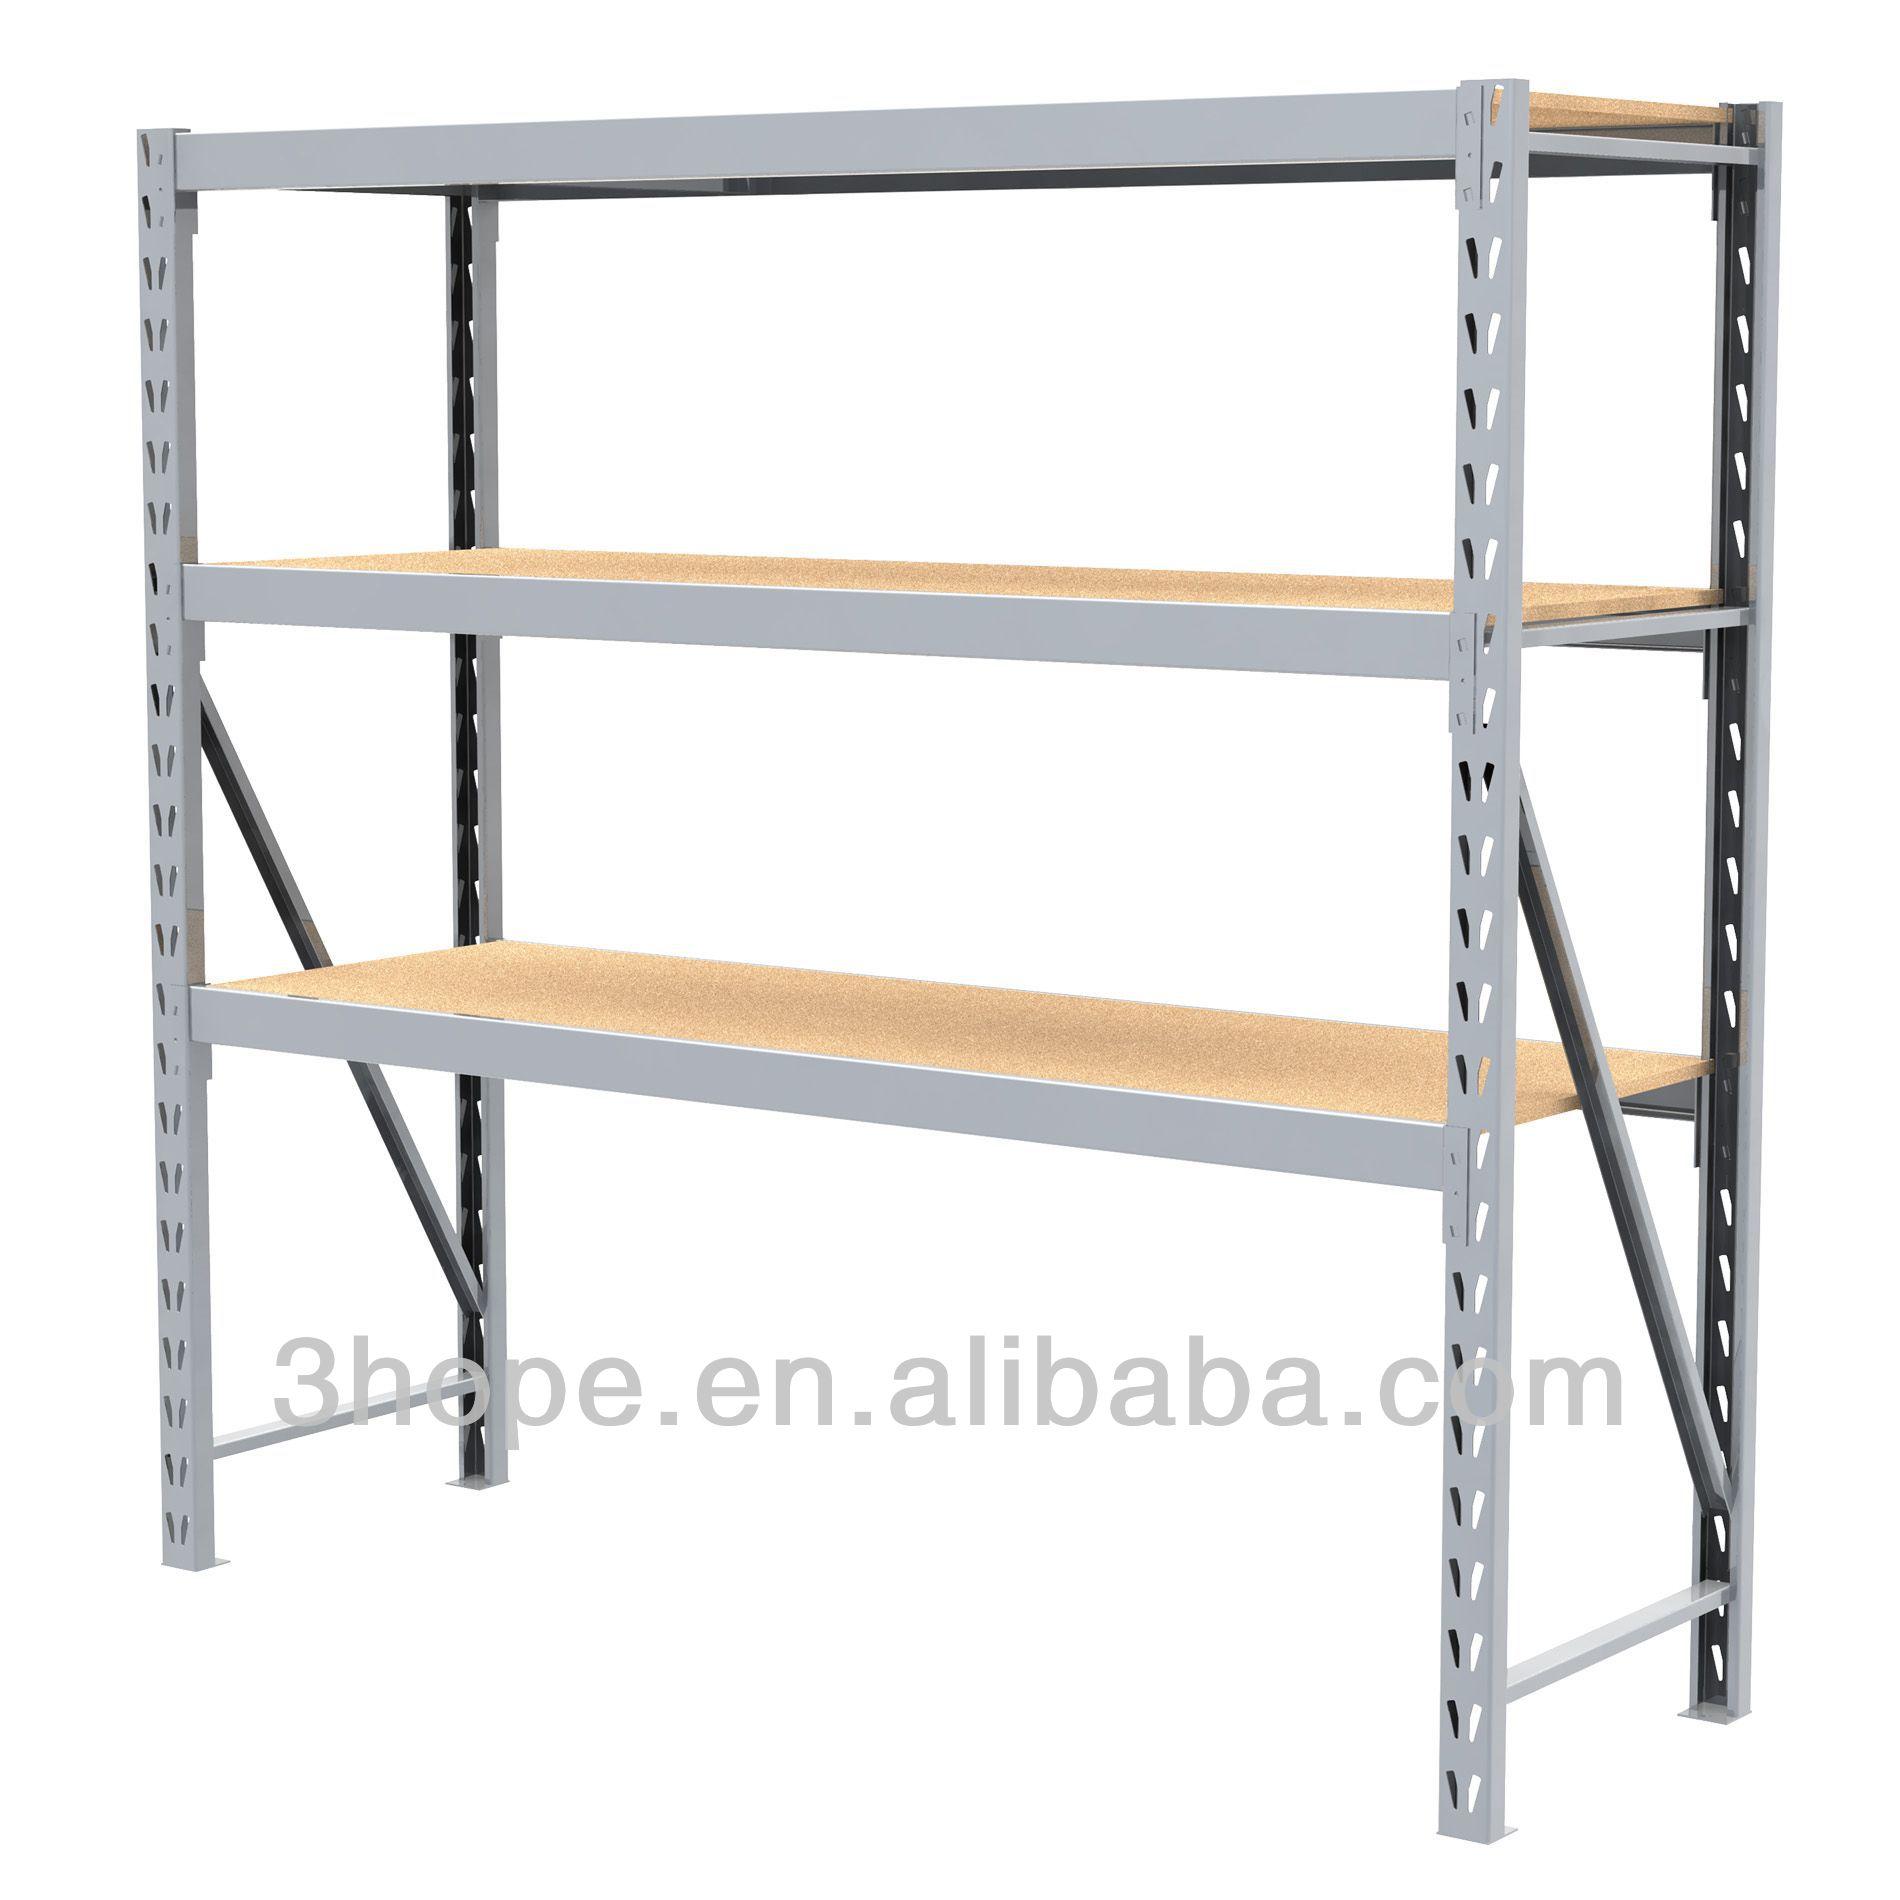 high quality industrial home depot storage racks lowes. Black Bedroom Furniture Sets. Home Design Ideas